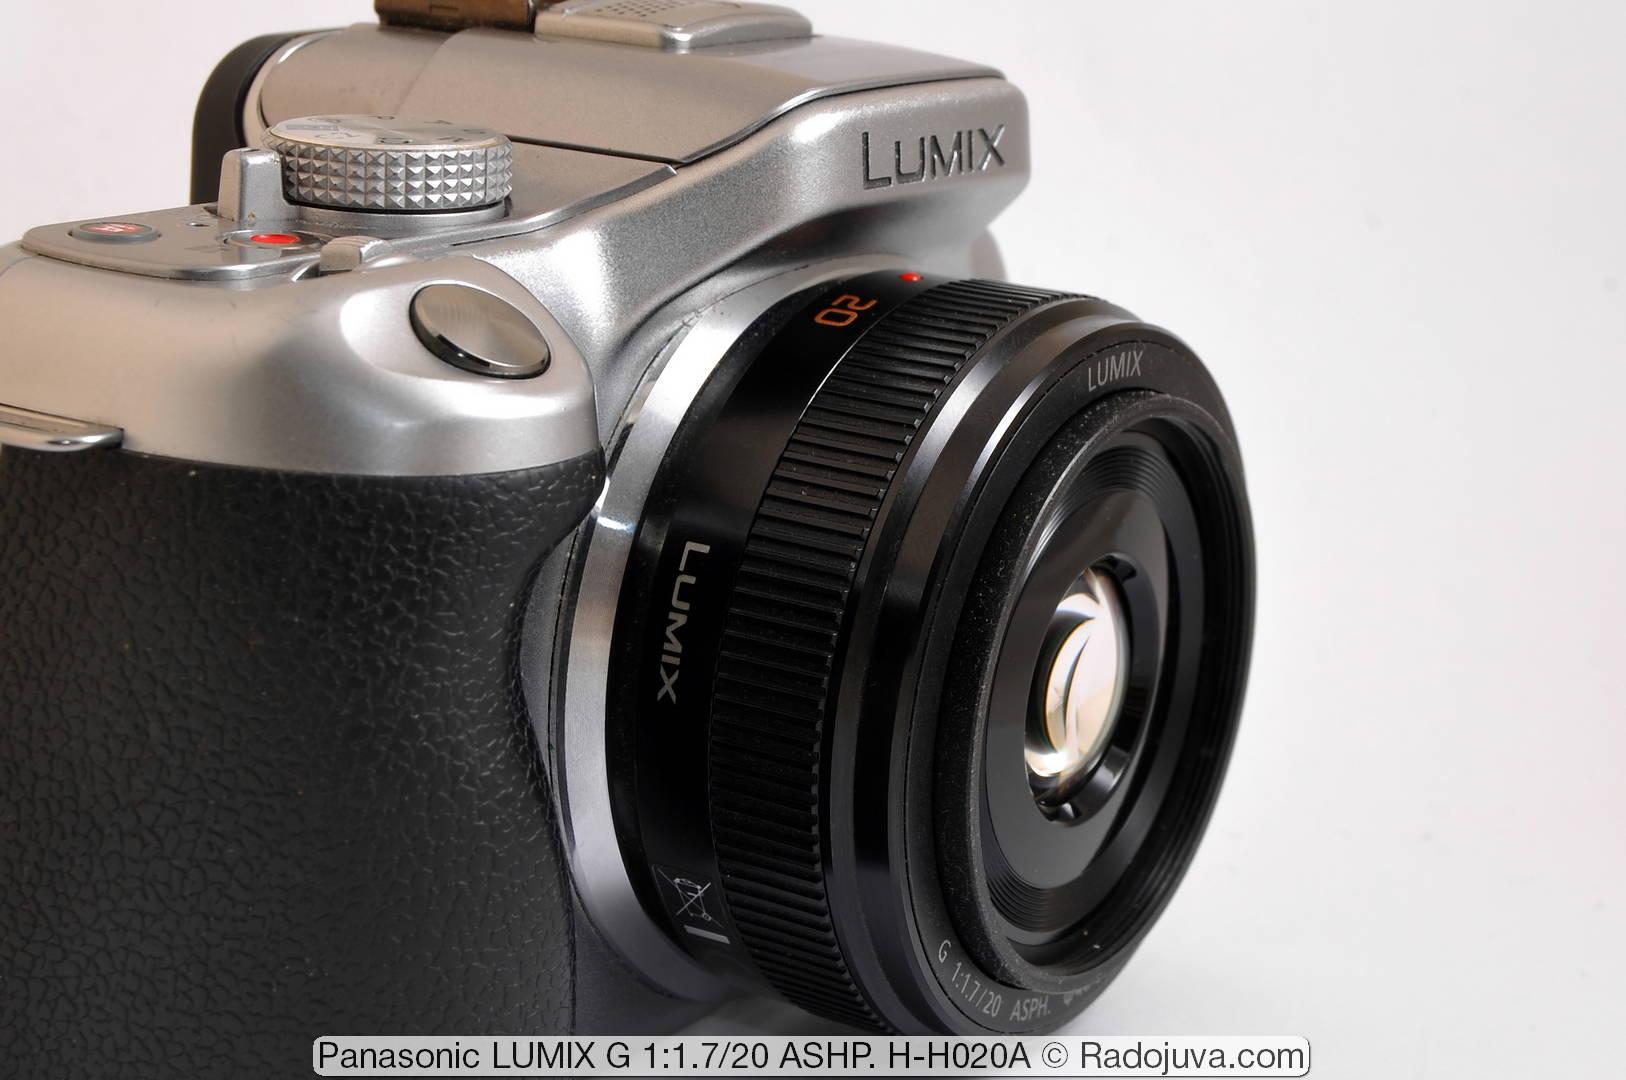 Panasonic LUMIX G 1:1.7/20 ASHP. (вторая версия, H-H020A)